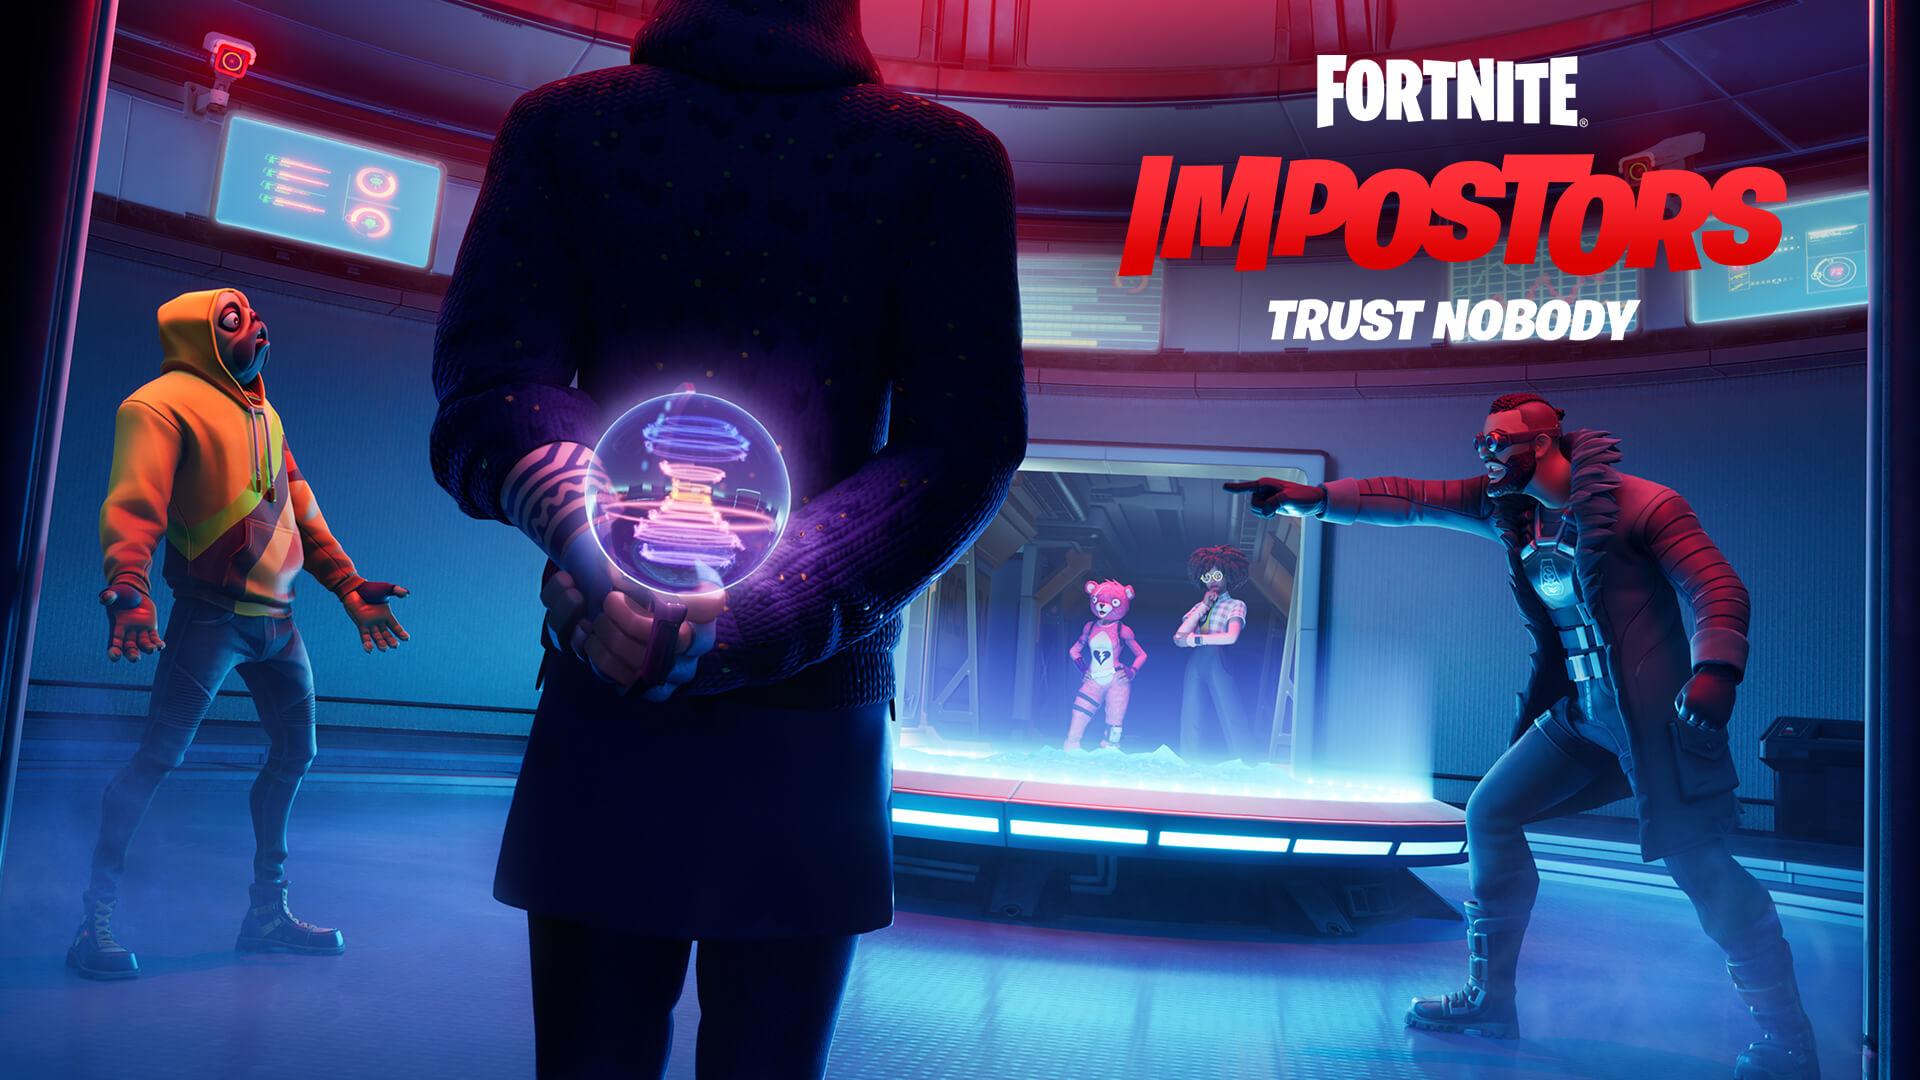 Fortnite Mode Impostors